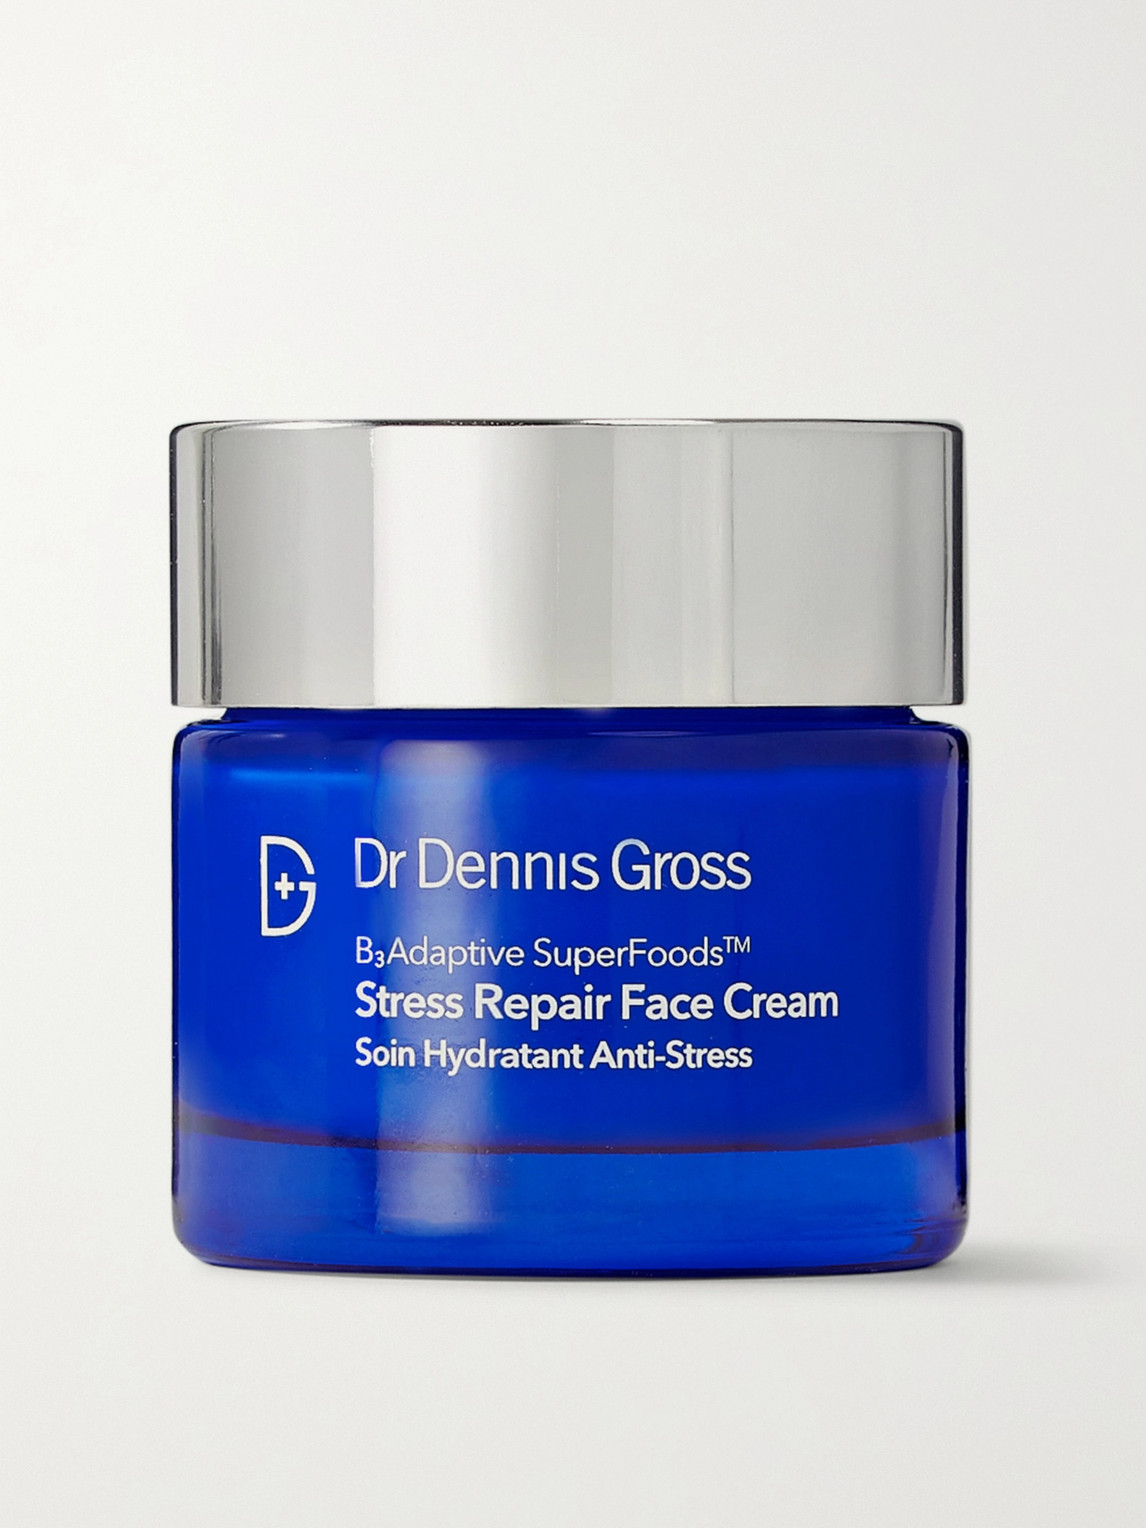 Dr. Dennis Gross Skincare Dr Dennis Gross Skincare B3adaptive Superfoods Stress Repair Face Cream 60ml In Colorless